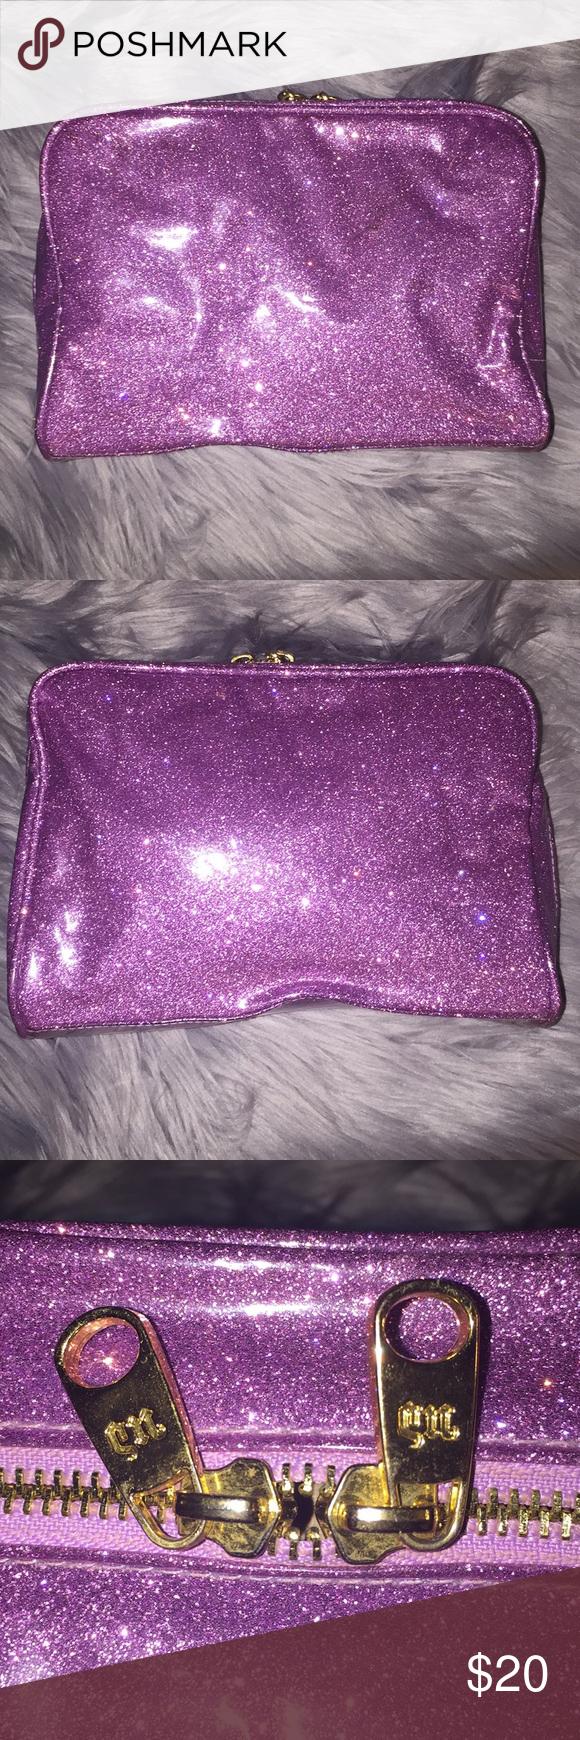 'hold it together' glitter case — purple glittery case